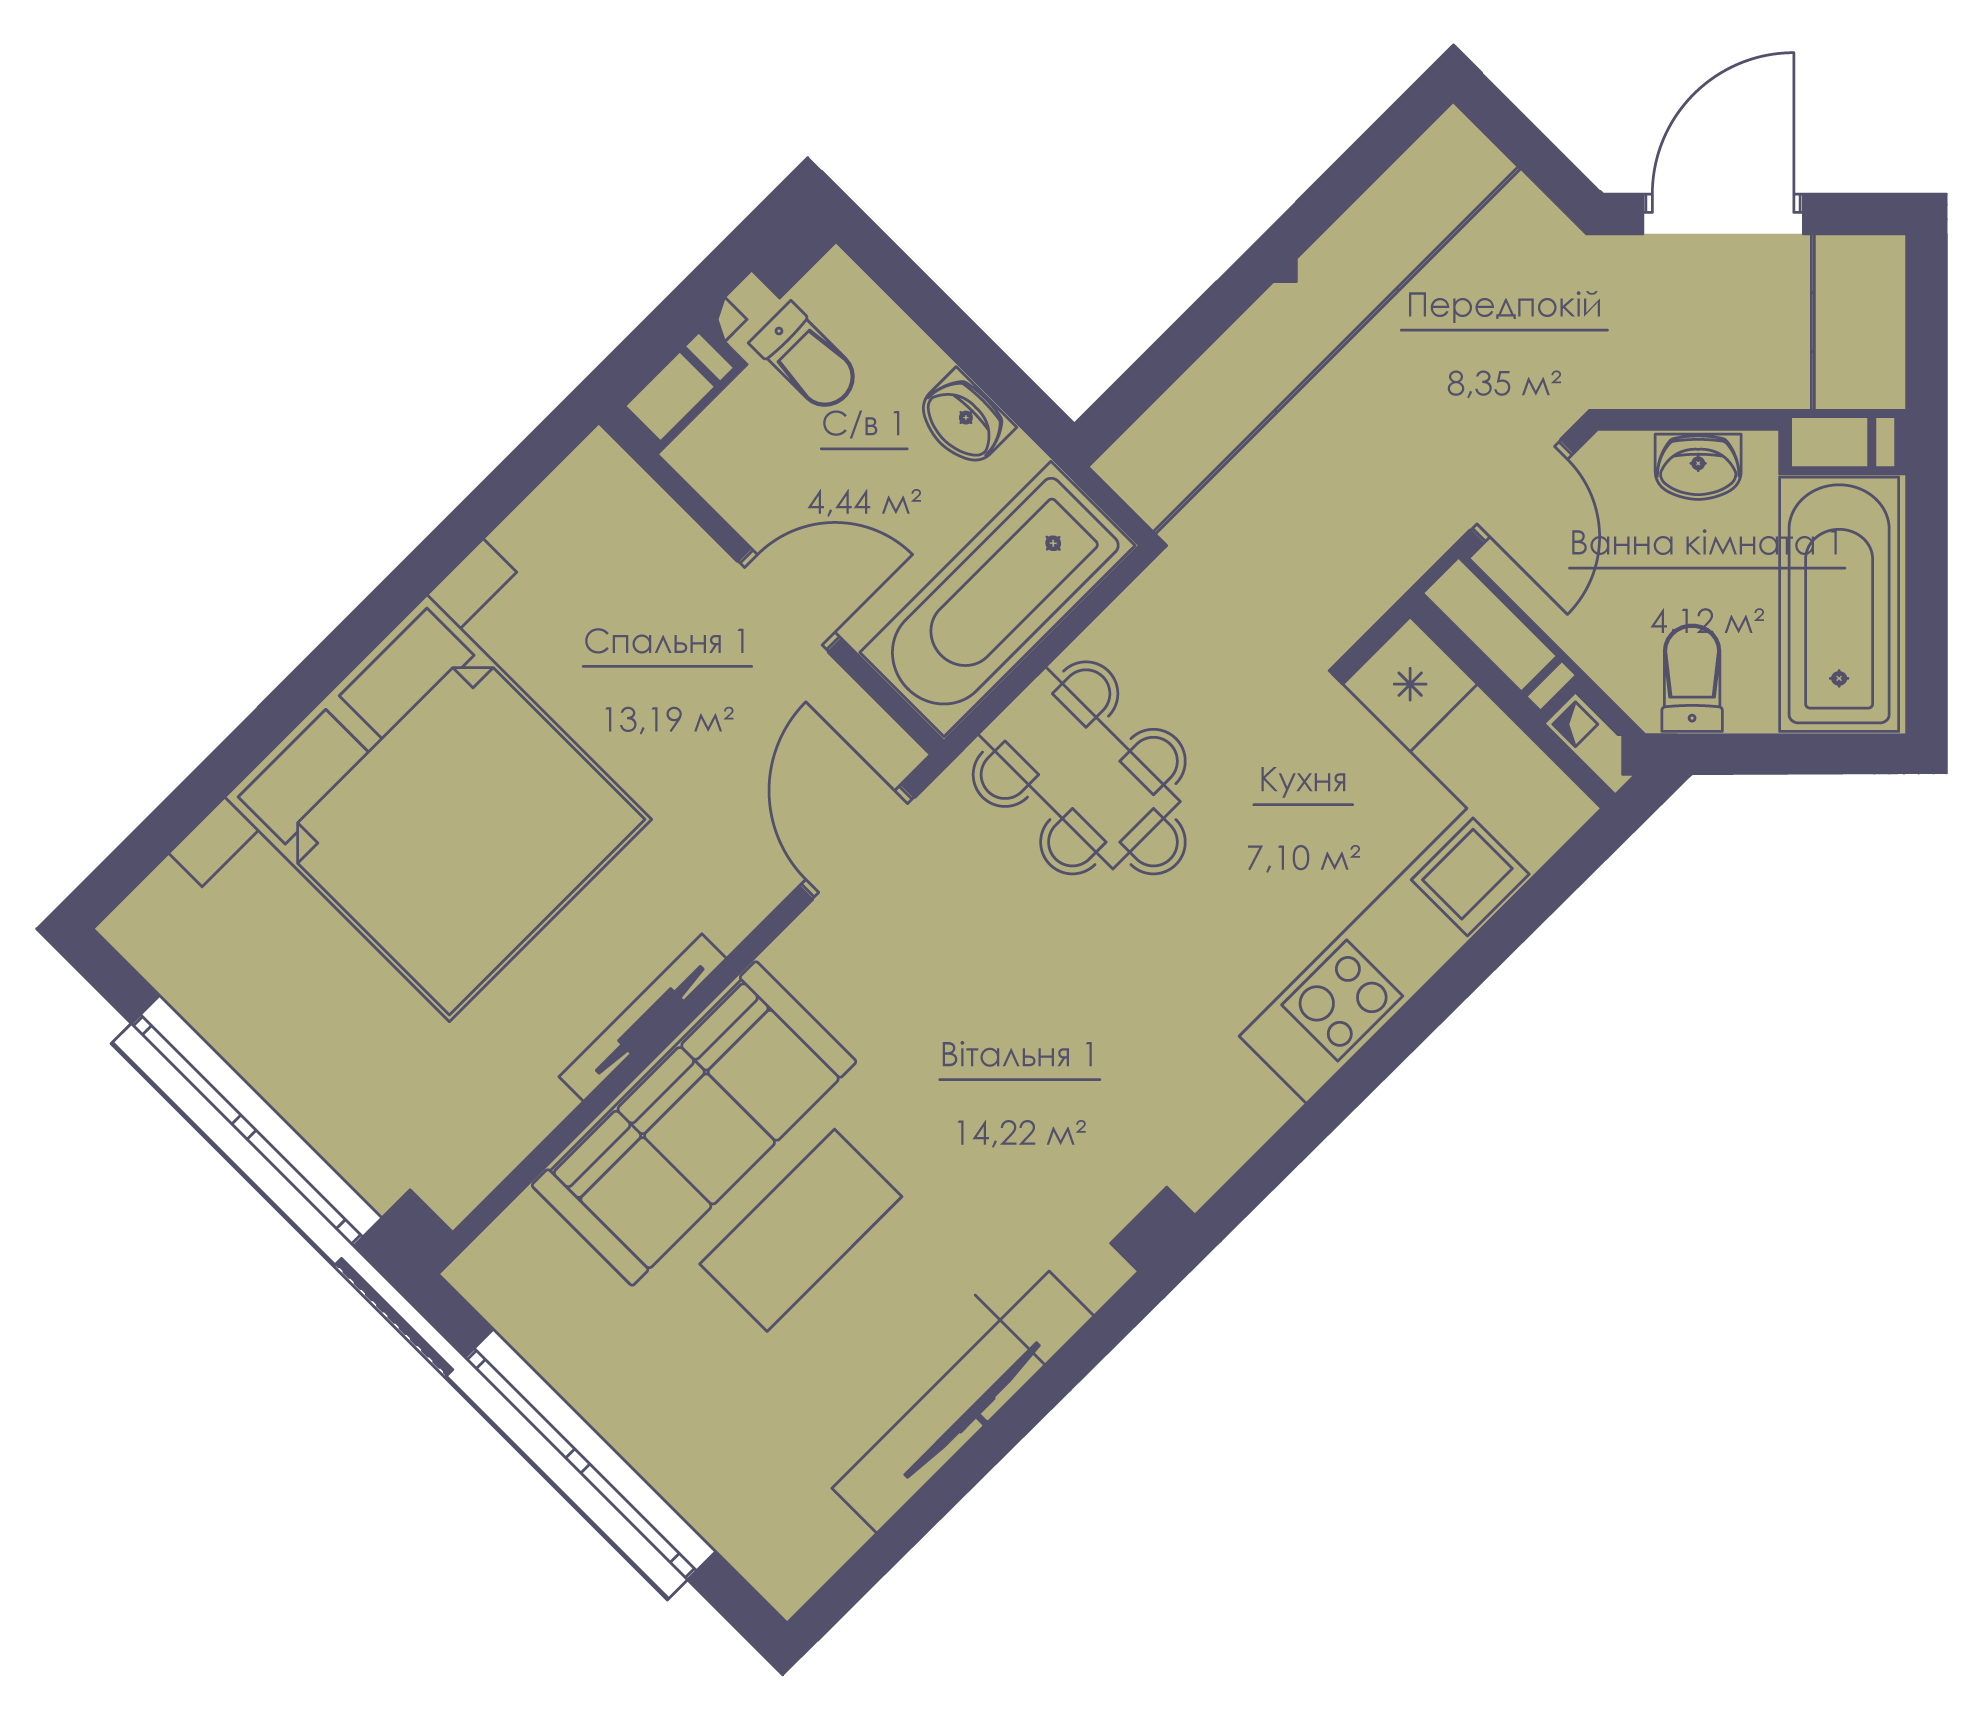 Apartment layout KV_71_2m_1_1_3-1